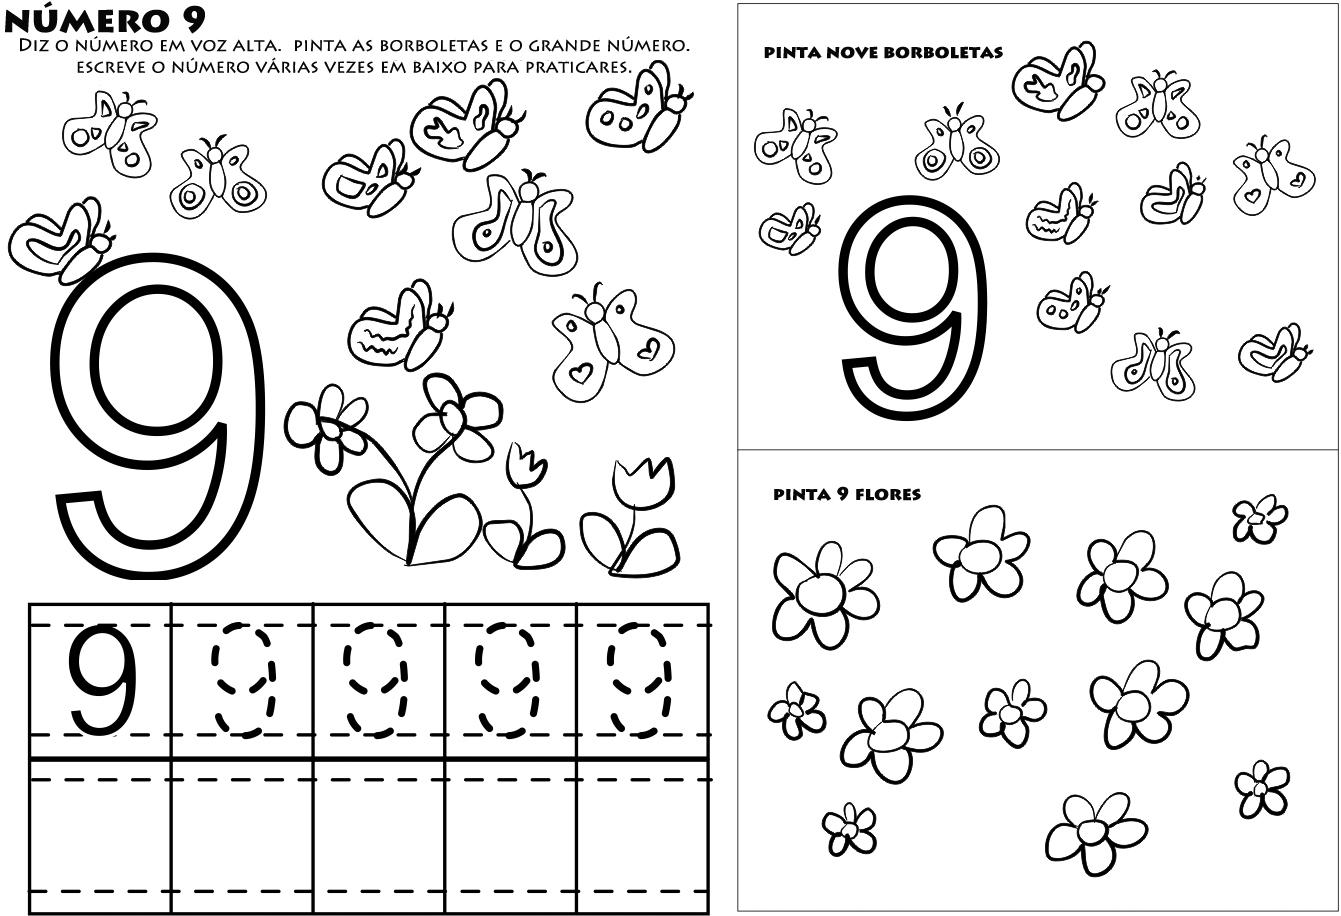 Colorir E Divertido Numero 9 Para Colorir